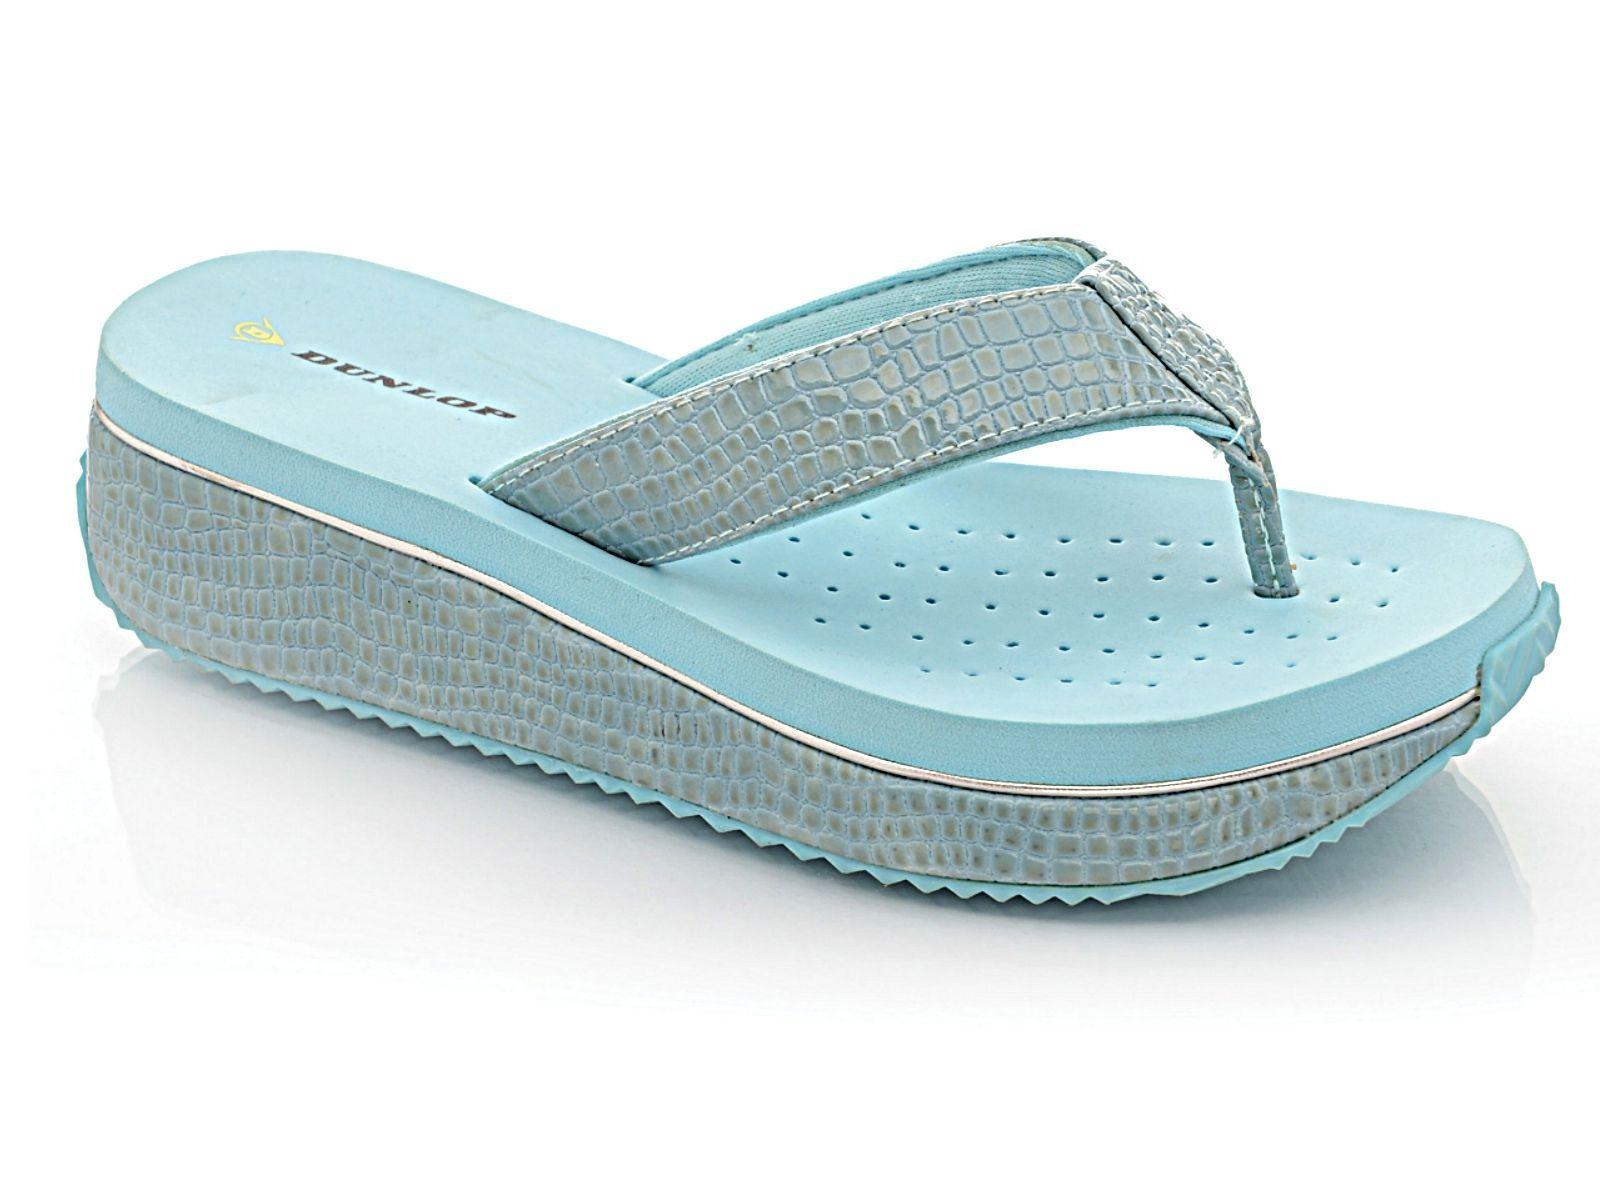 fc0fe21ffa Ladies Dunlop Toe Post Flip Flop Wedge Summer Beach Sandals Shoe | eBay